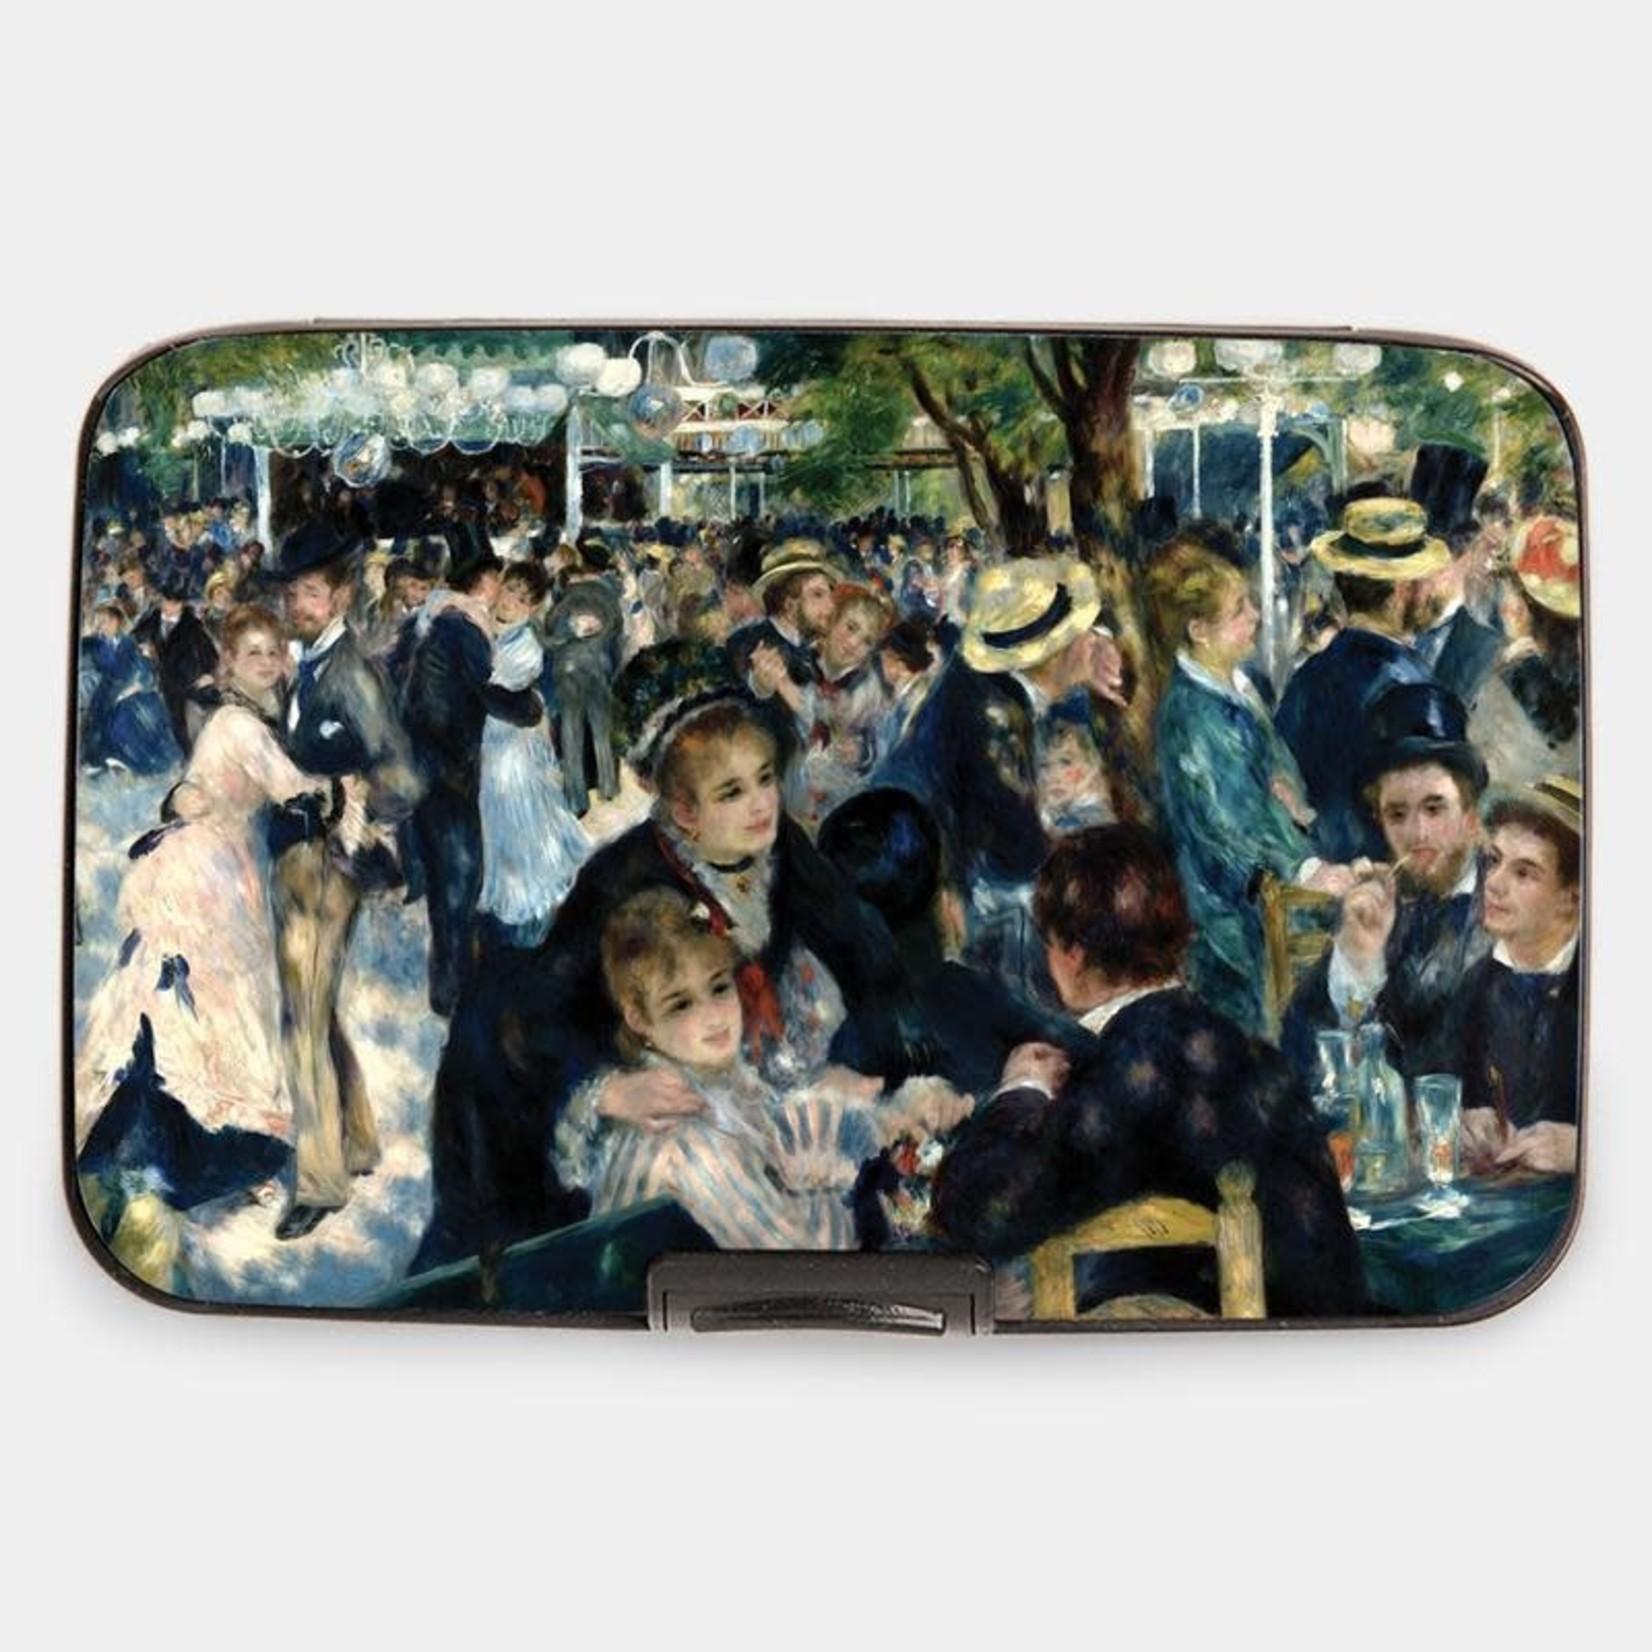 Monarque Armored Wallet - Renoir - Le Moulan De La Gallette